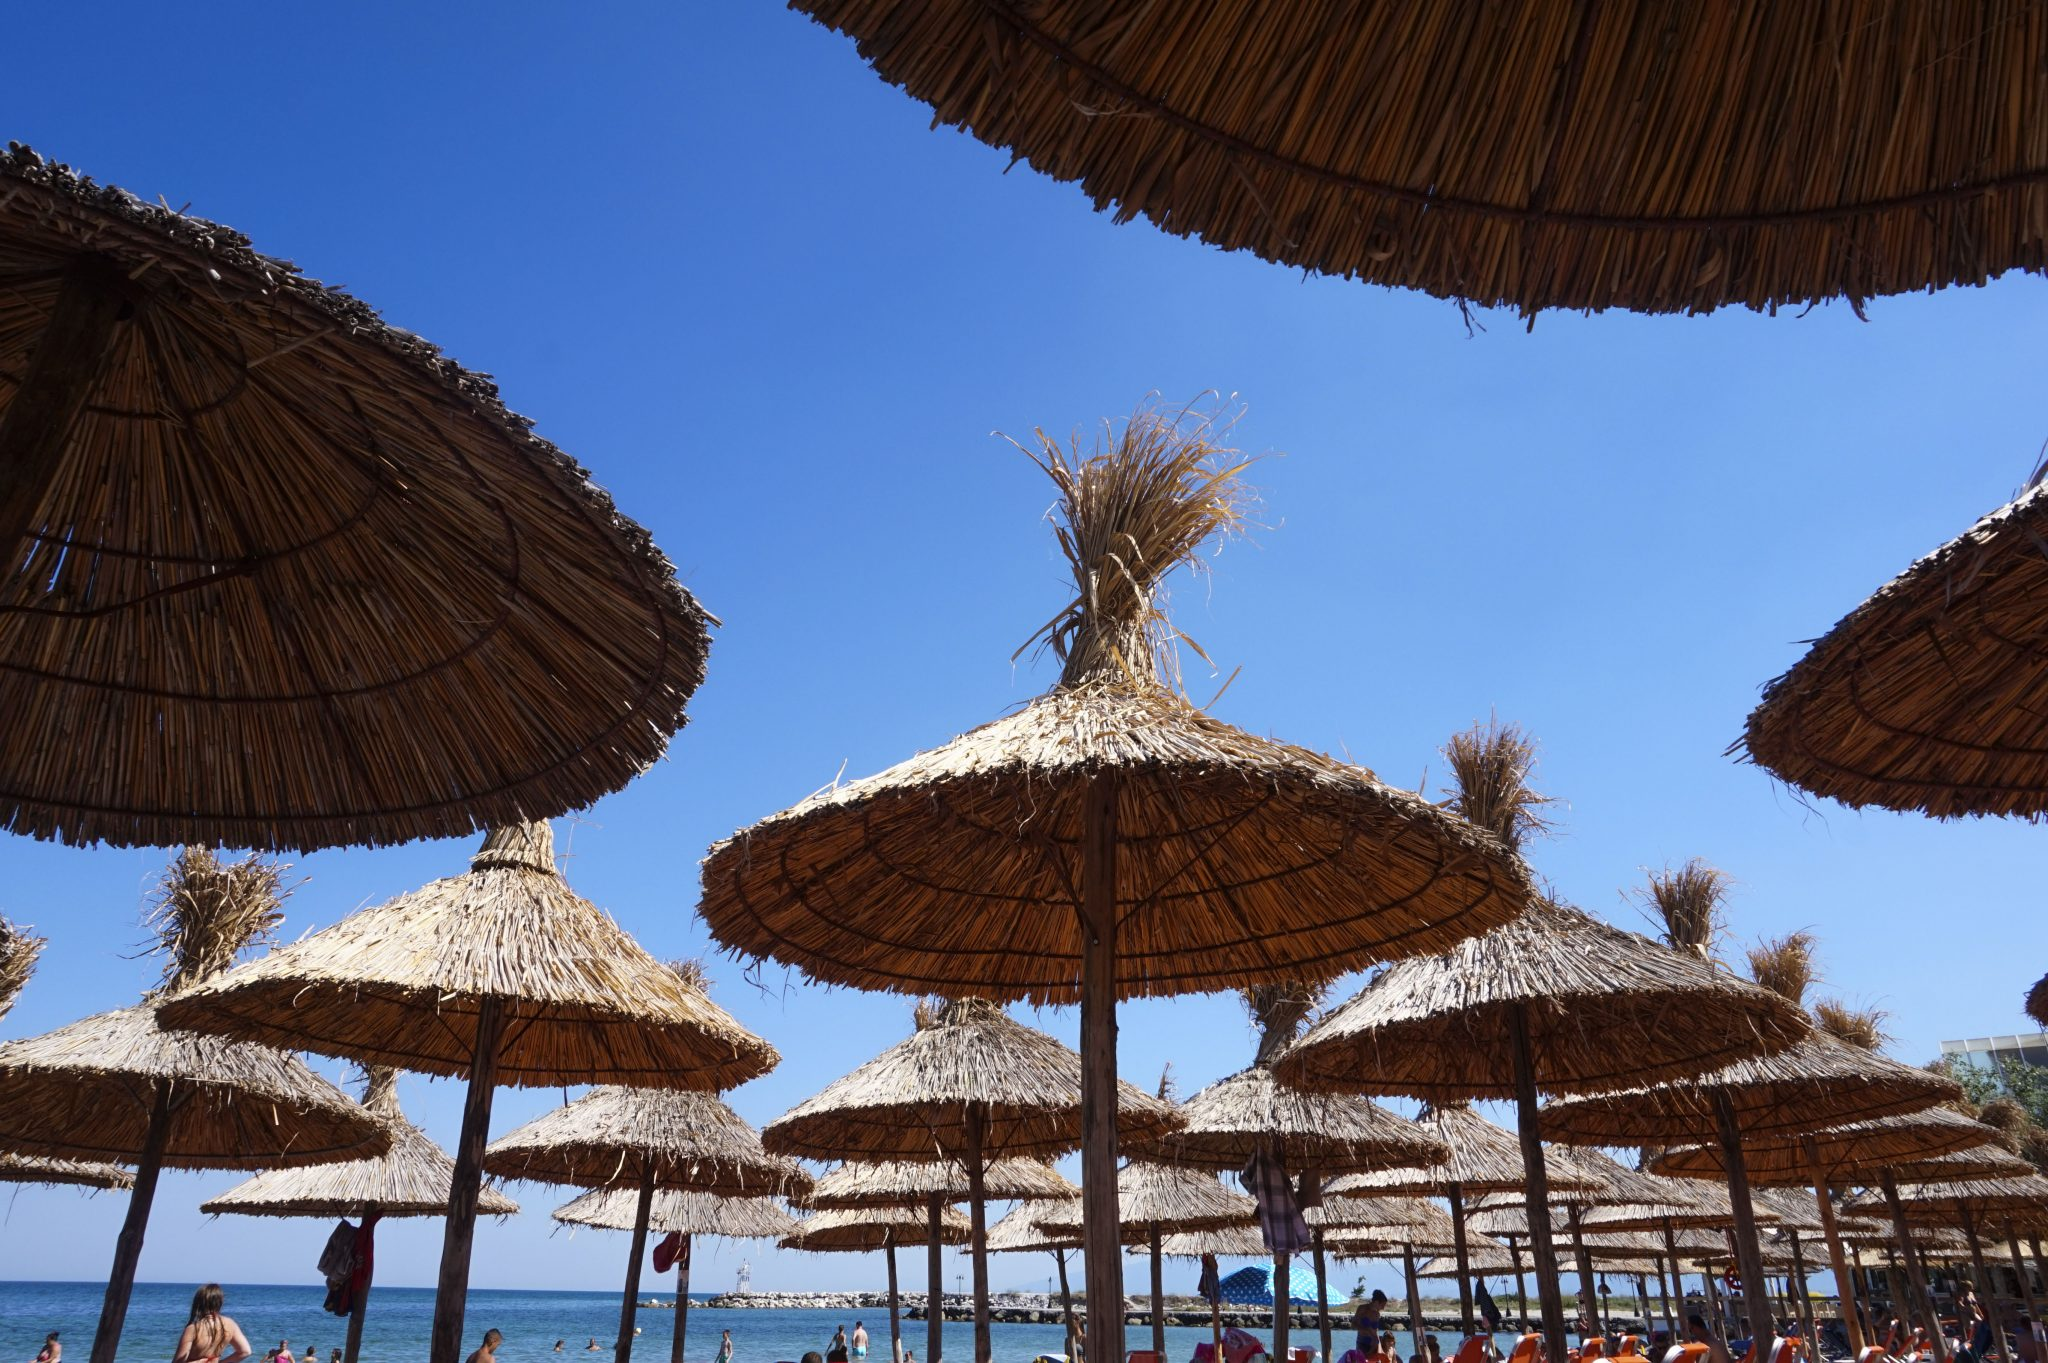 beach day in paralia katerini greece